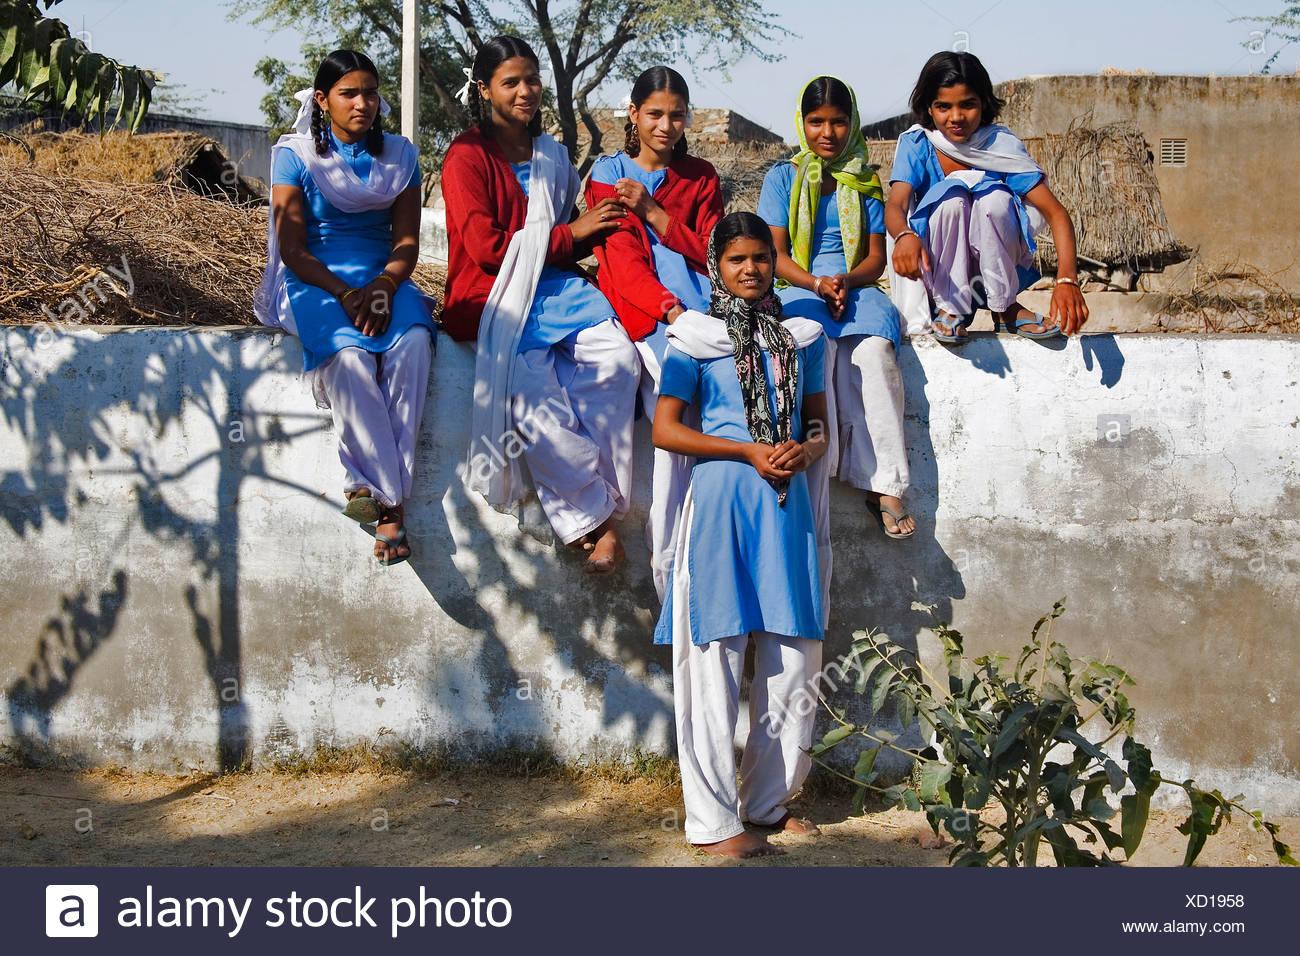 Indian School Girls Stock Photos & Indian School Girls Stock Images